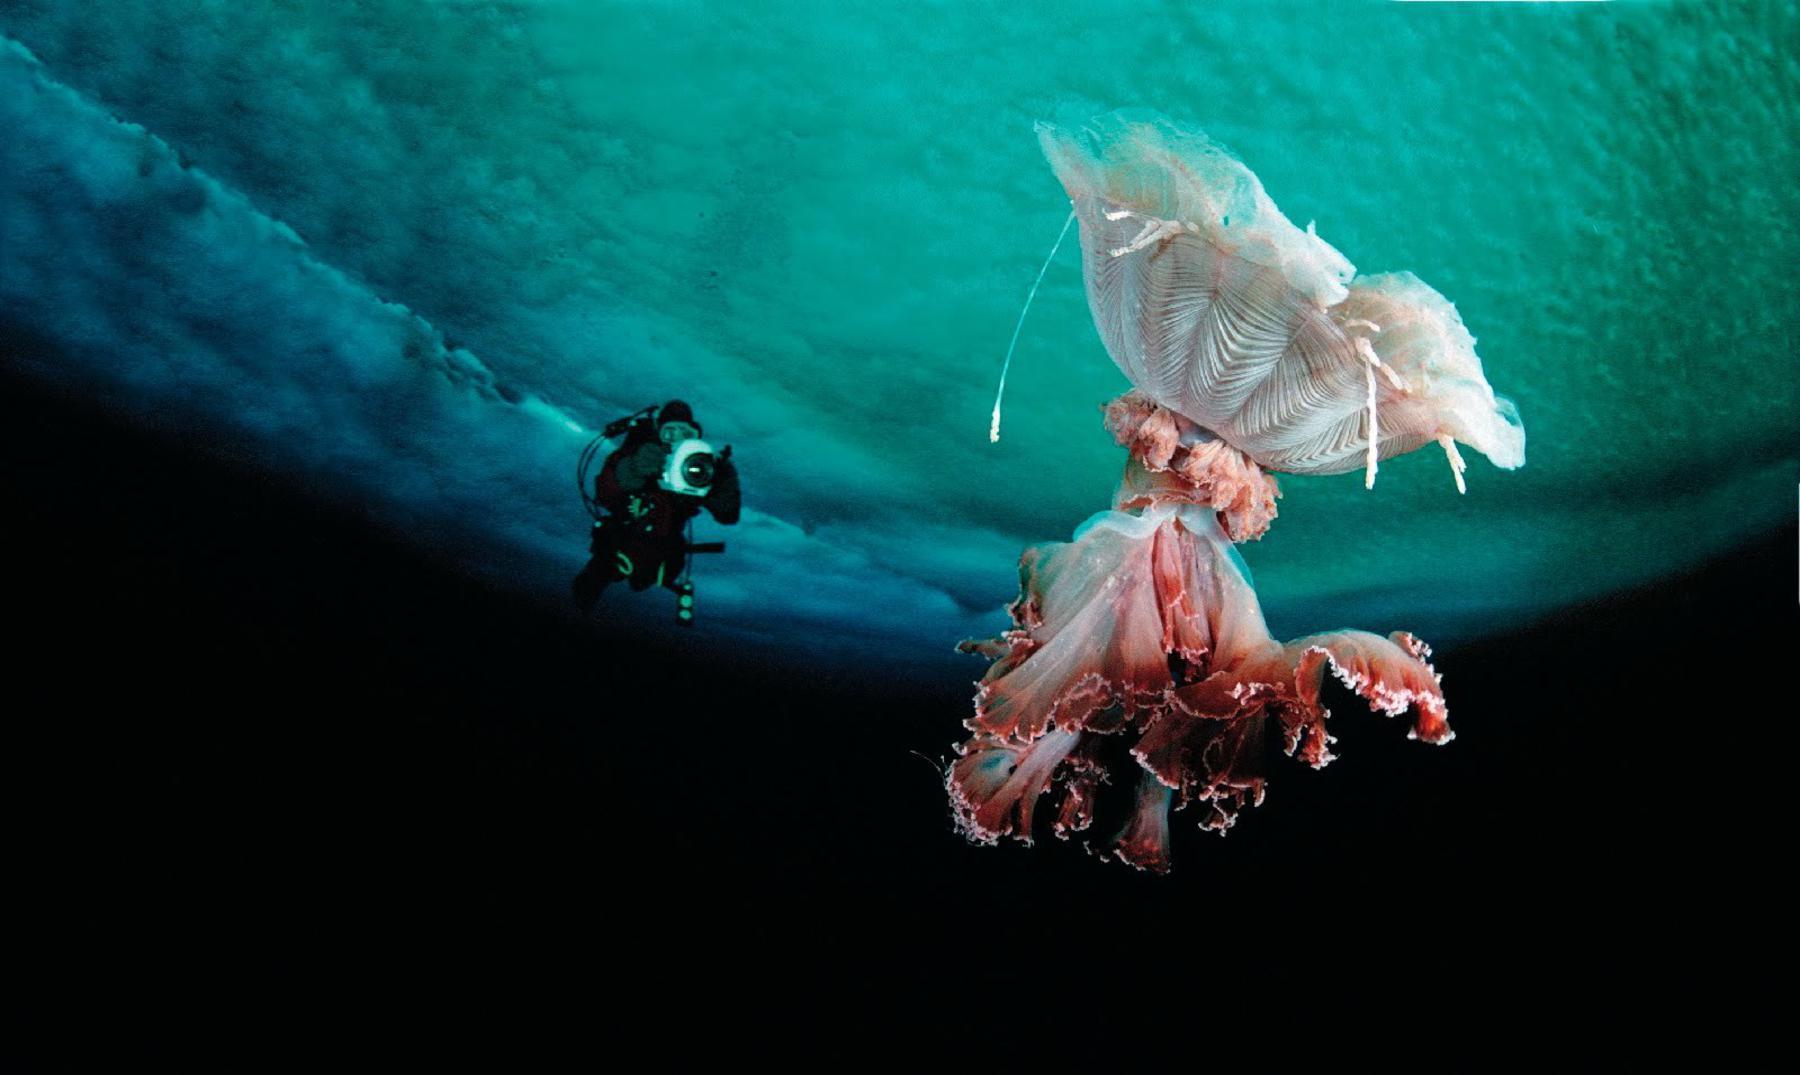 Un monstruo marino: la medusa cabeza de león